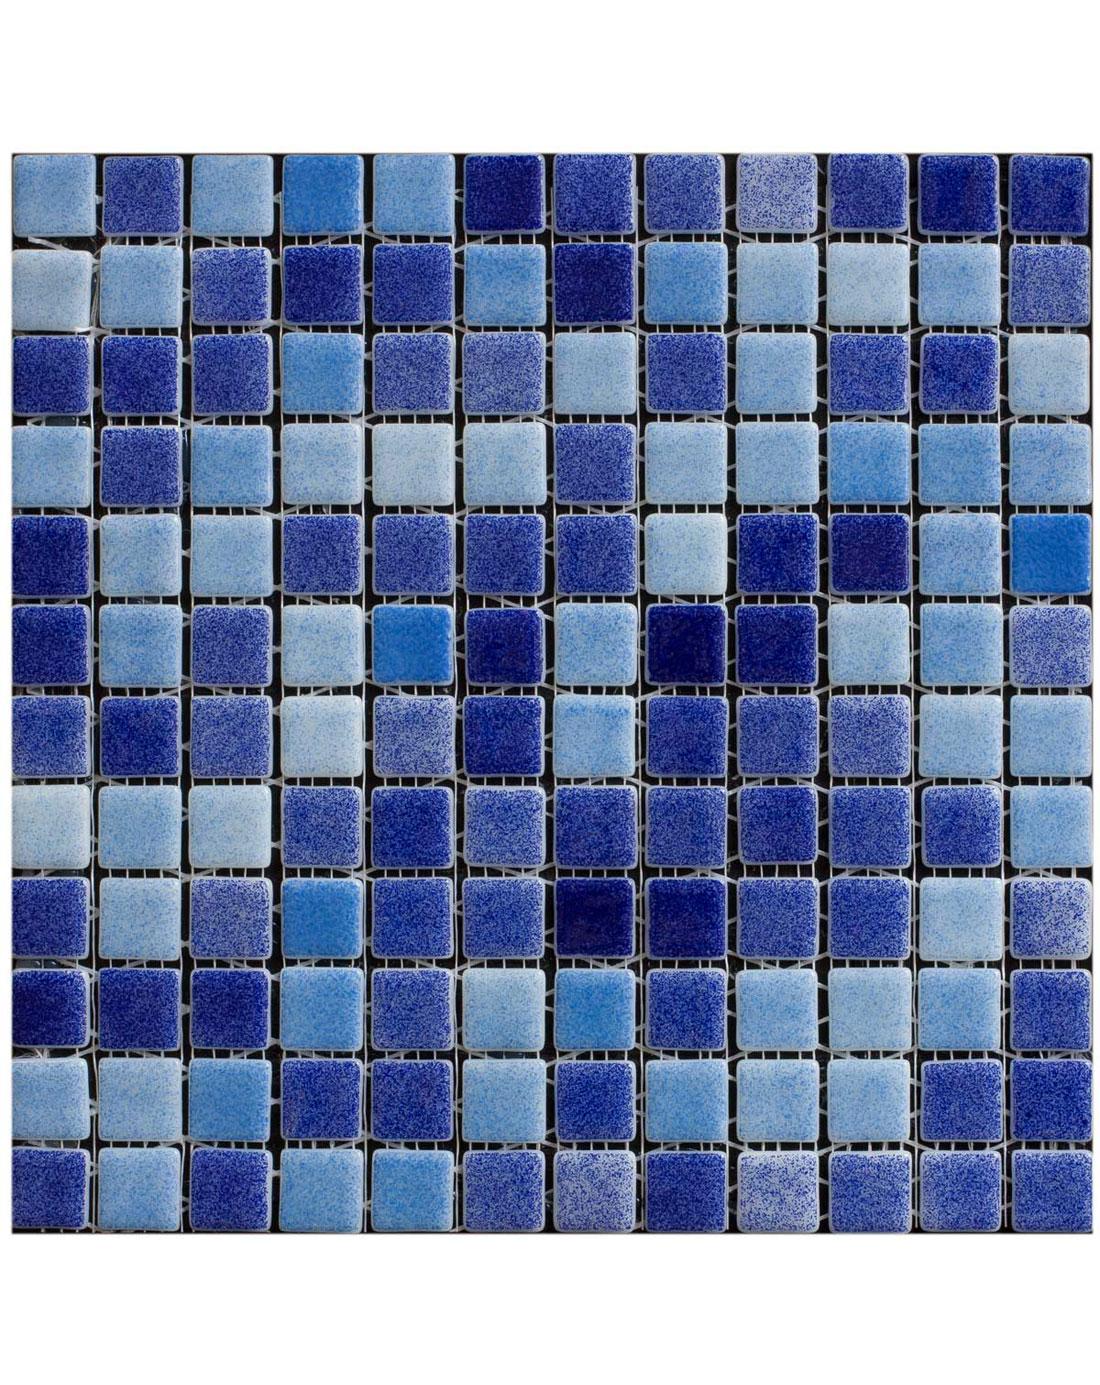 Blue Pool Mix Mosaic Wall Tiles - Kitchen Tiles Direct